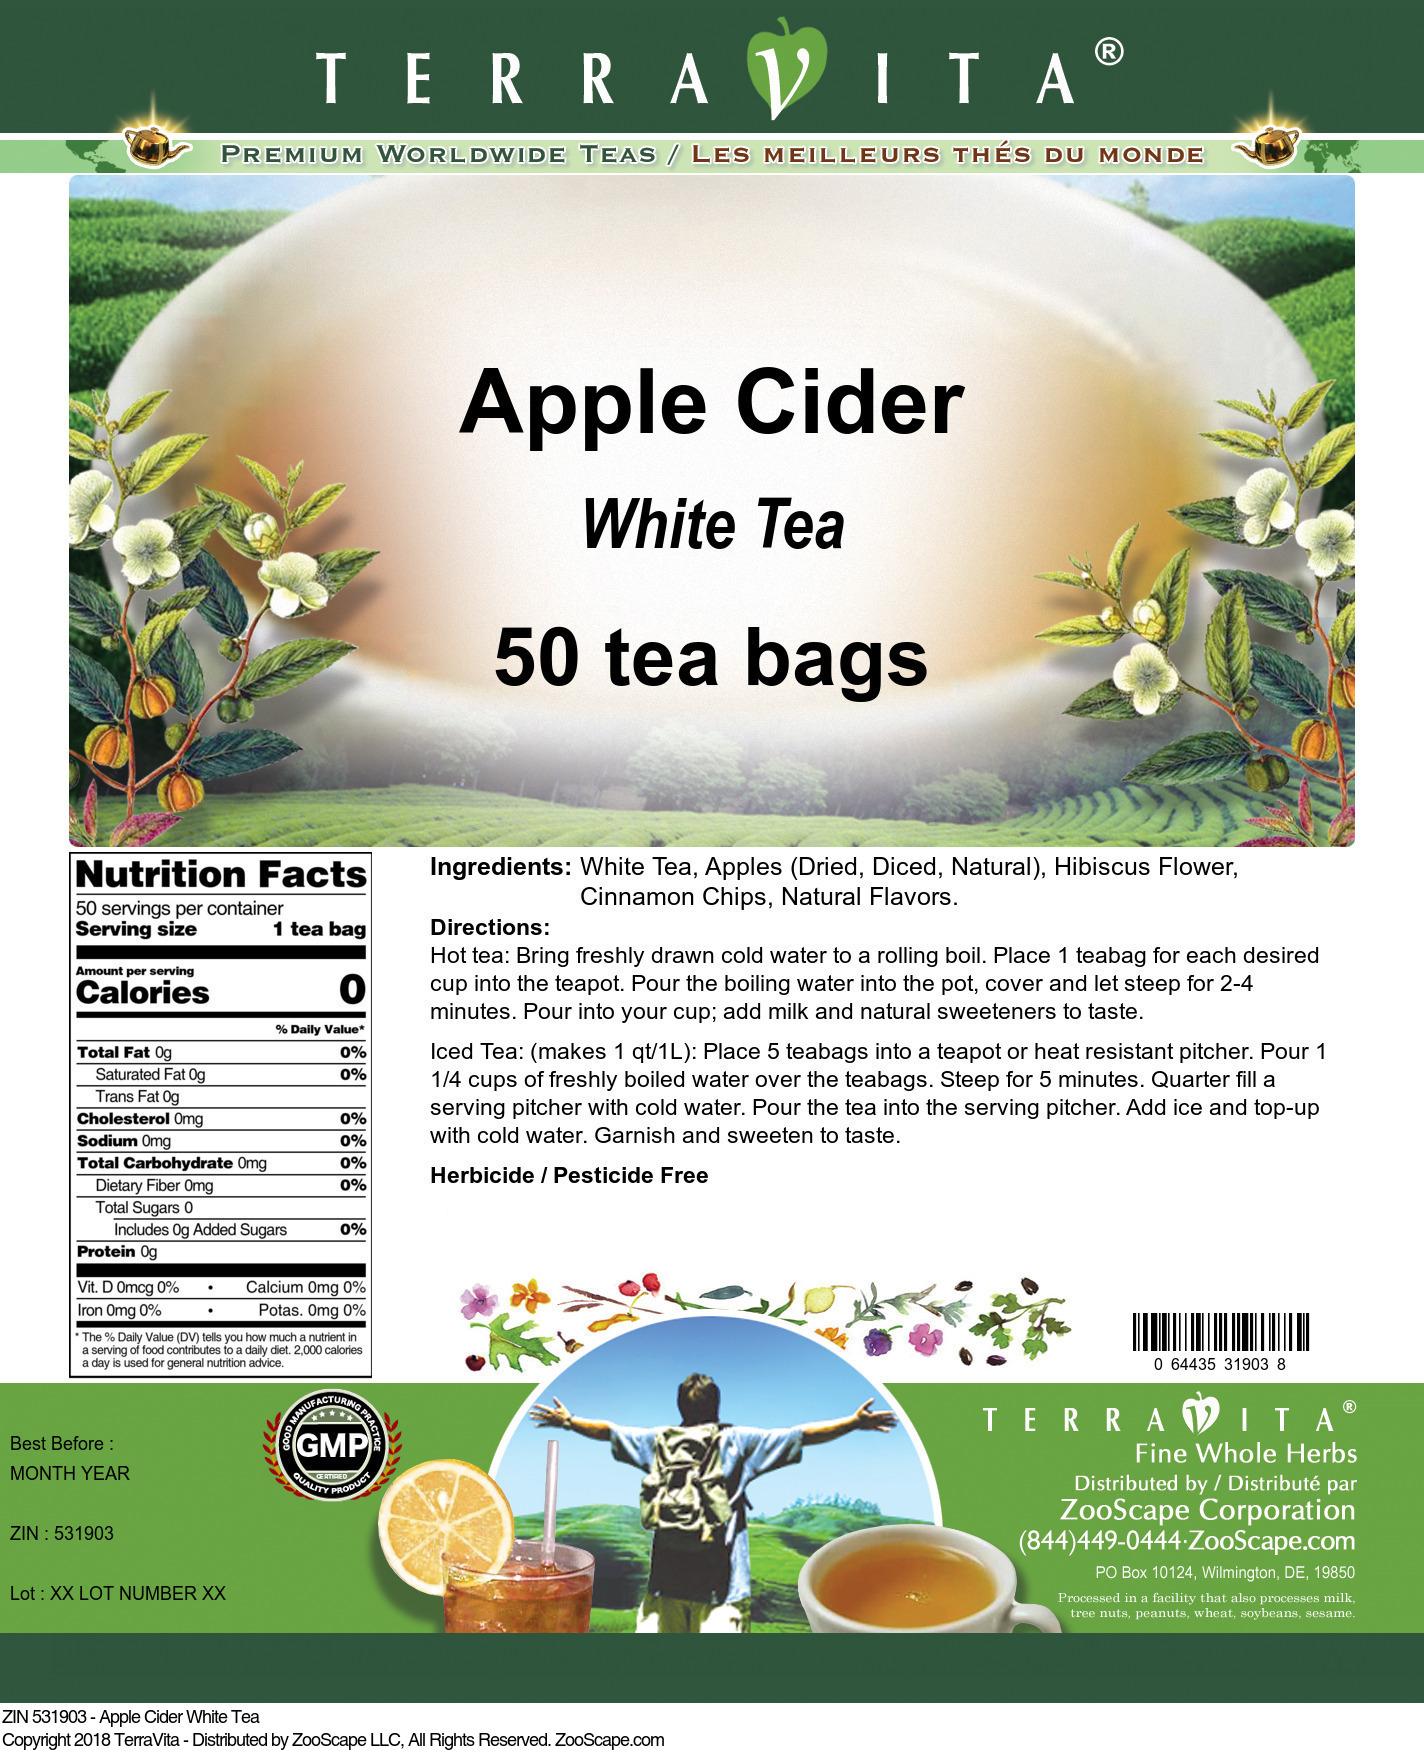 Apple Cider White Tea